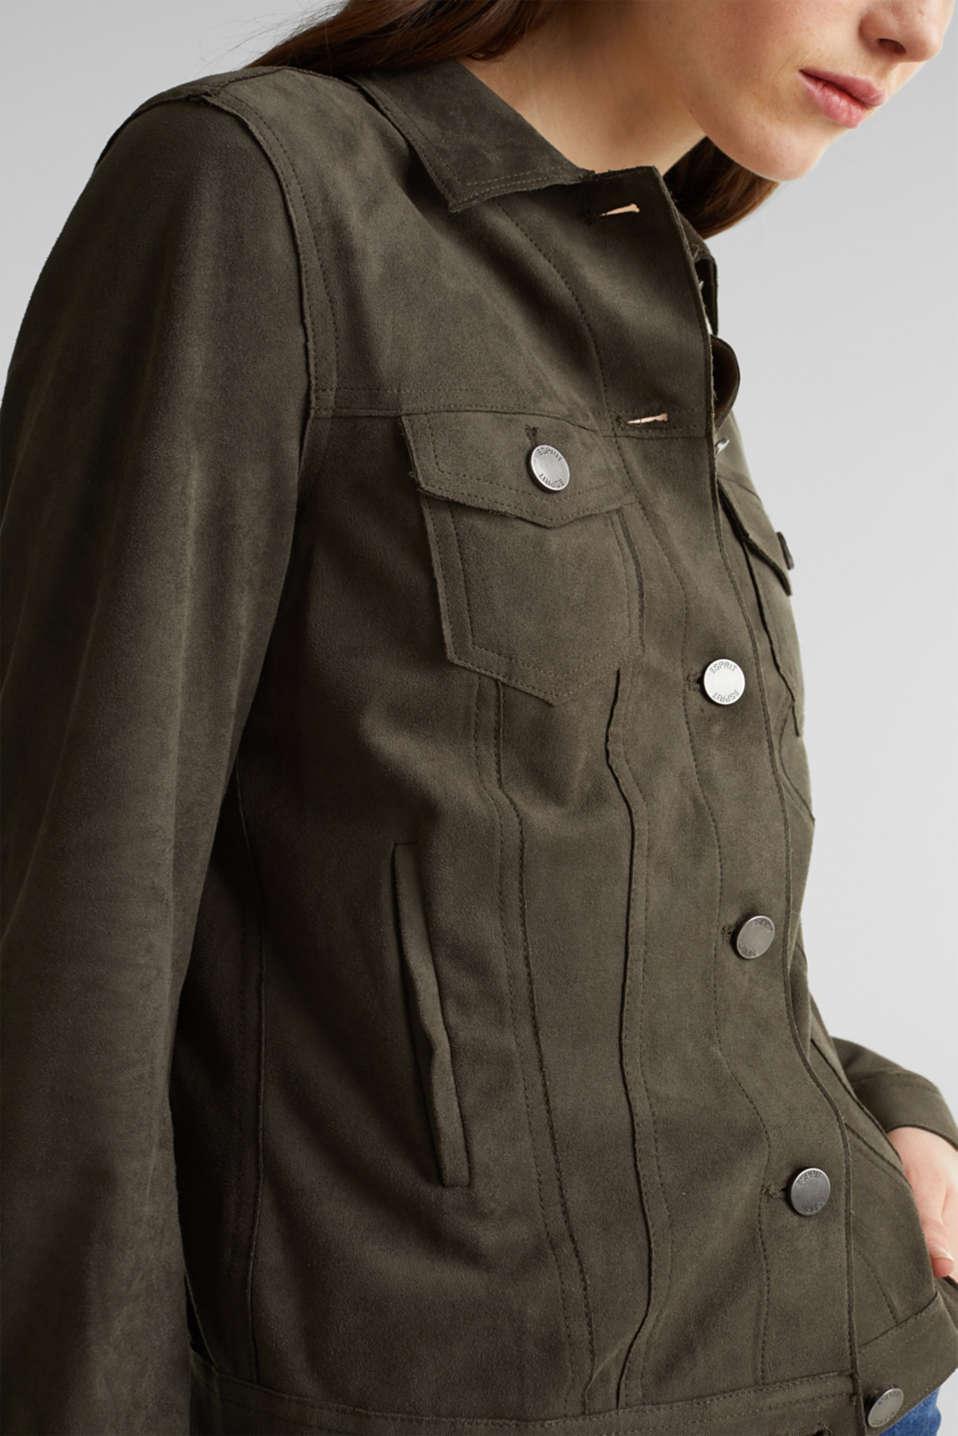 Soft faux suede jacket, KHAKI GREEN, detail image number 2